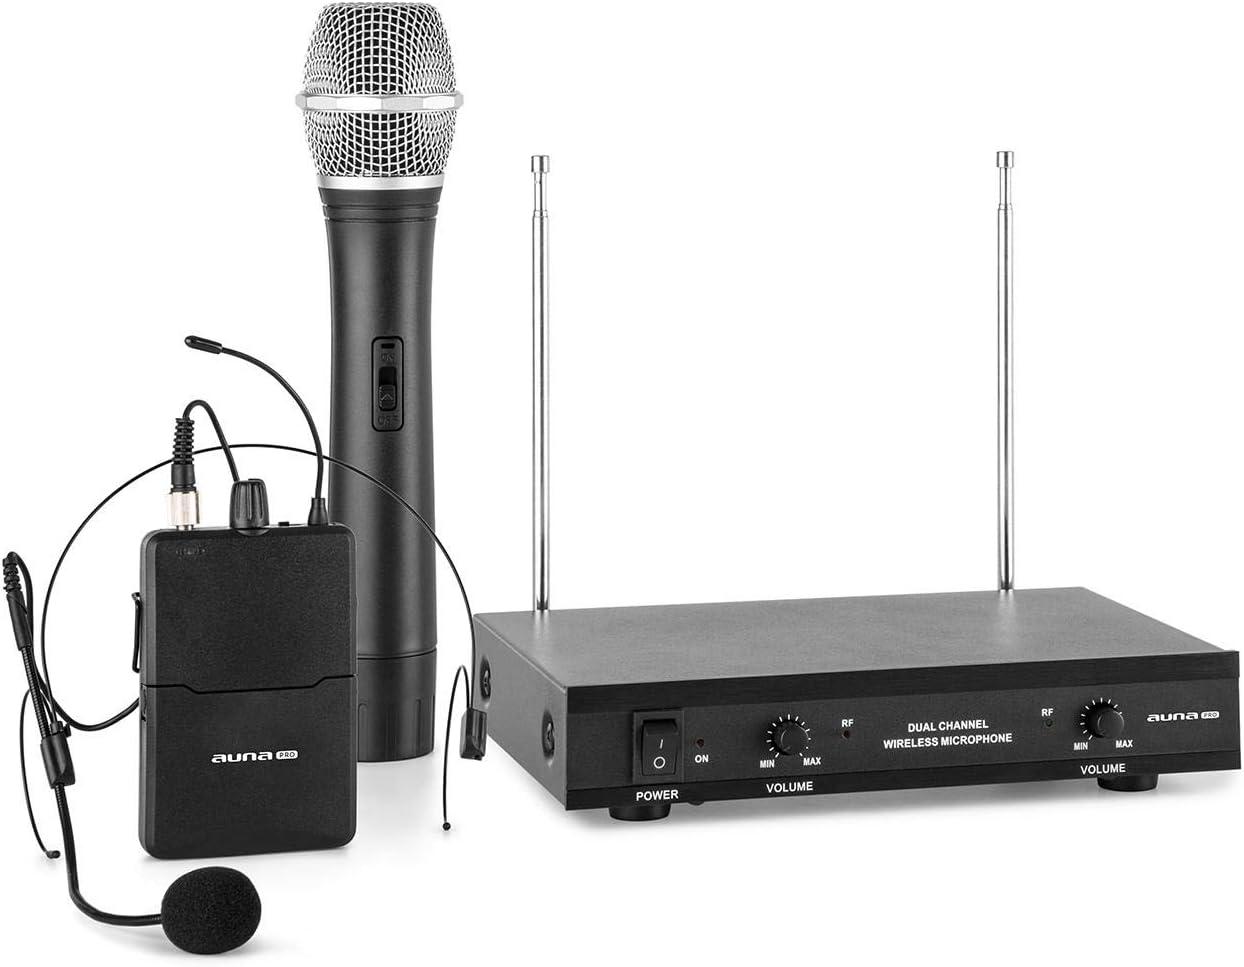 2-Kanal-drahtloses dynamisches Dual-Handheld-Mikrofonsystem Tangxi Drahtloses Handmikrofon drahtloses Karaoke-Audiomikrofon f/ür Konferenz//Computer 50-m-Empfang